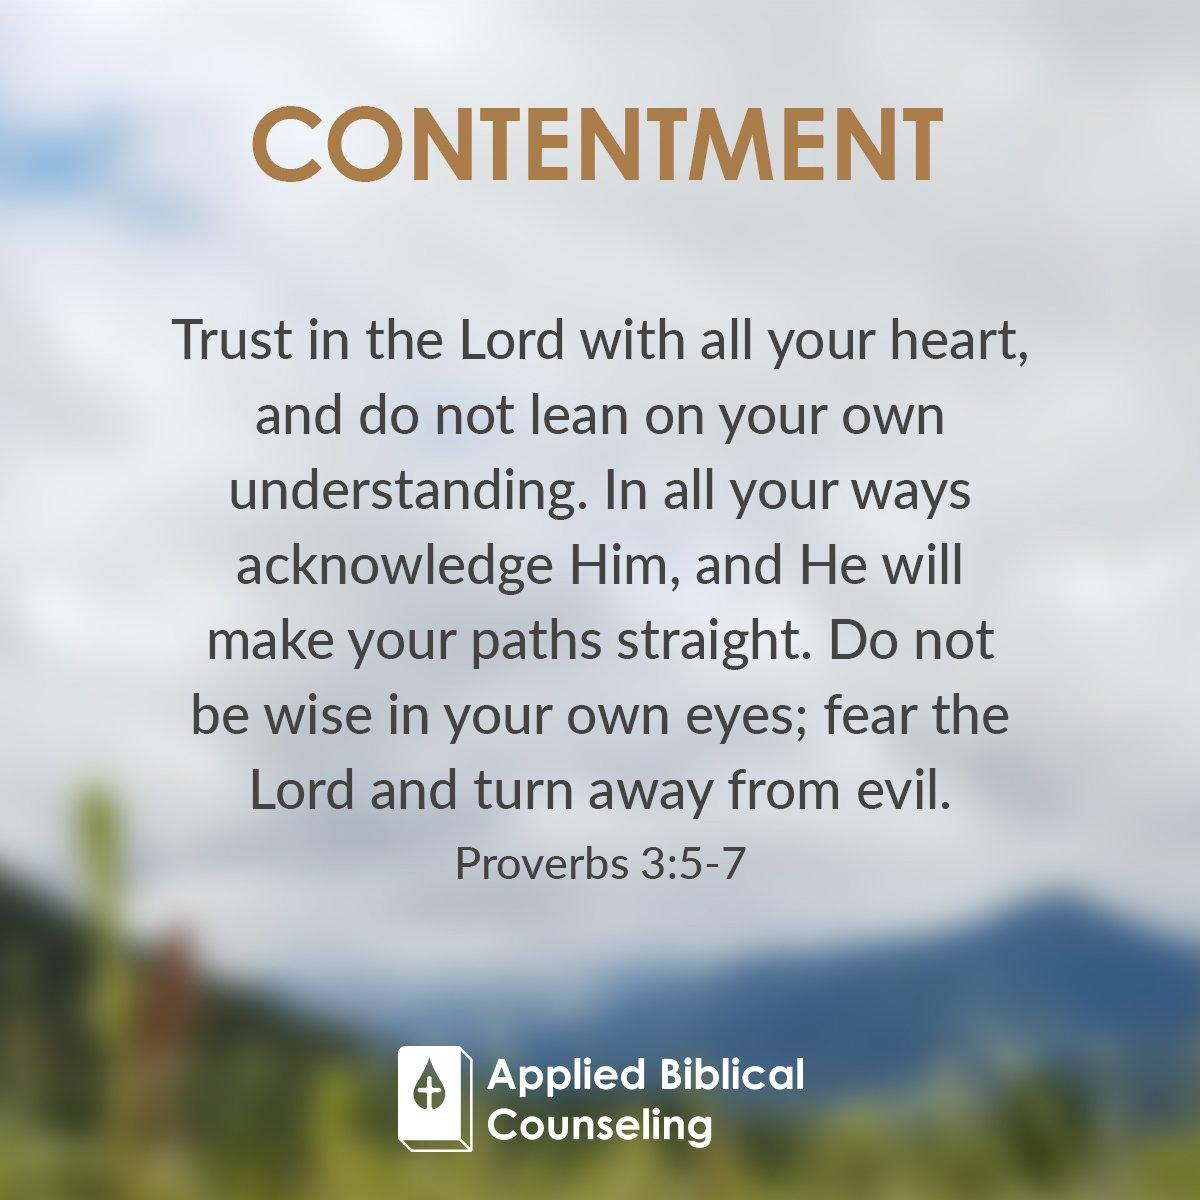 Contentment 5